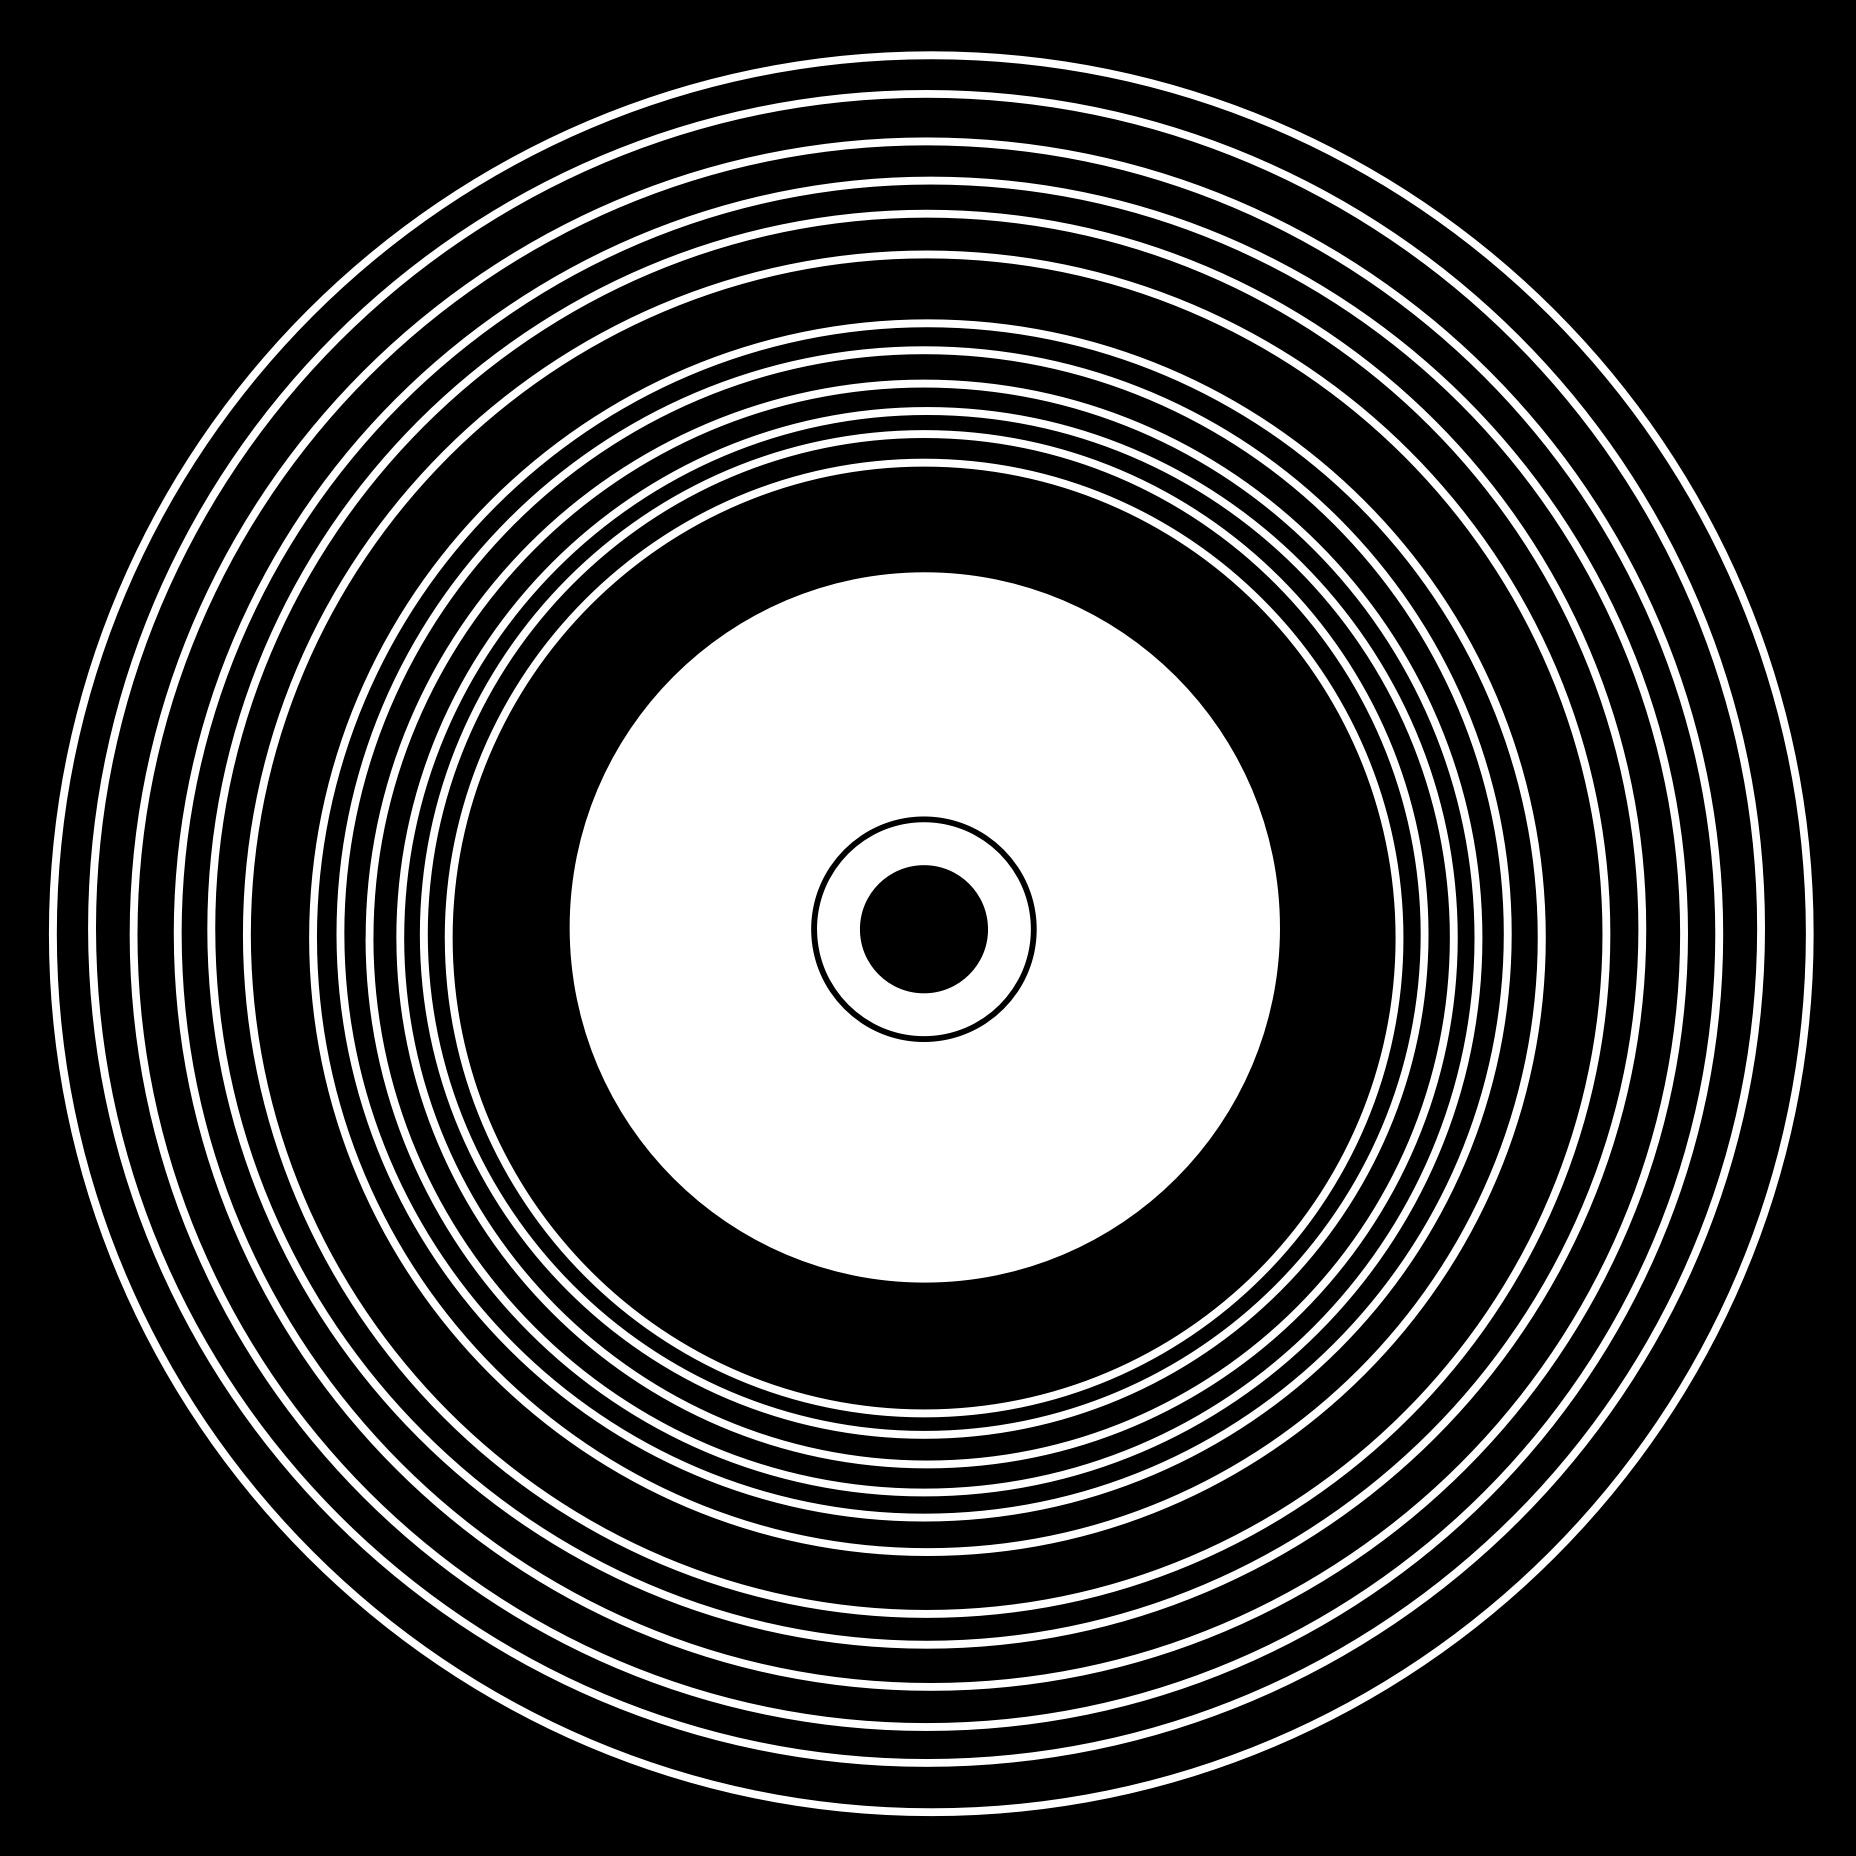 Grades clipart recording. Vinyl record drawing at